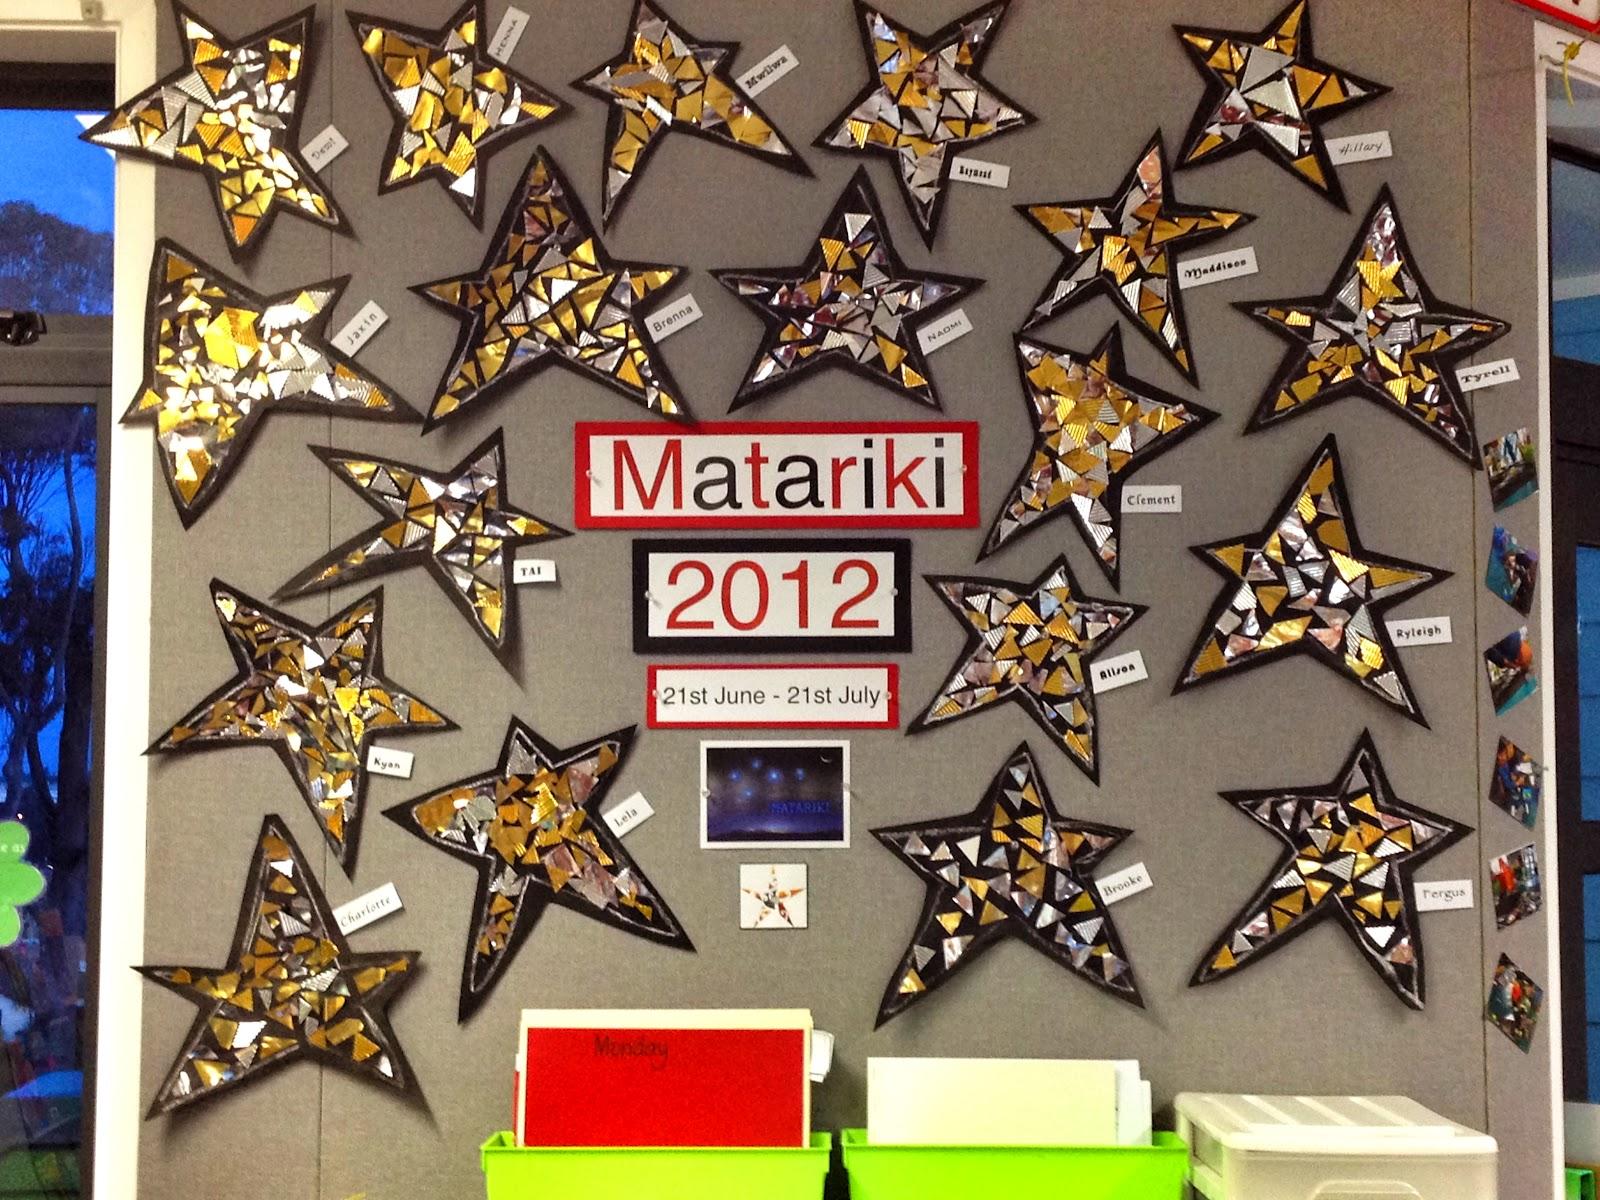 Room 8 Pinehill School Matariki Art Work